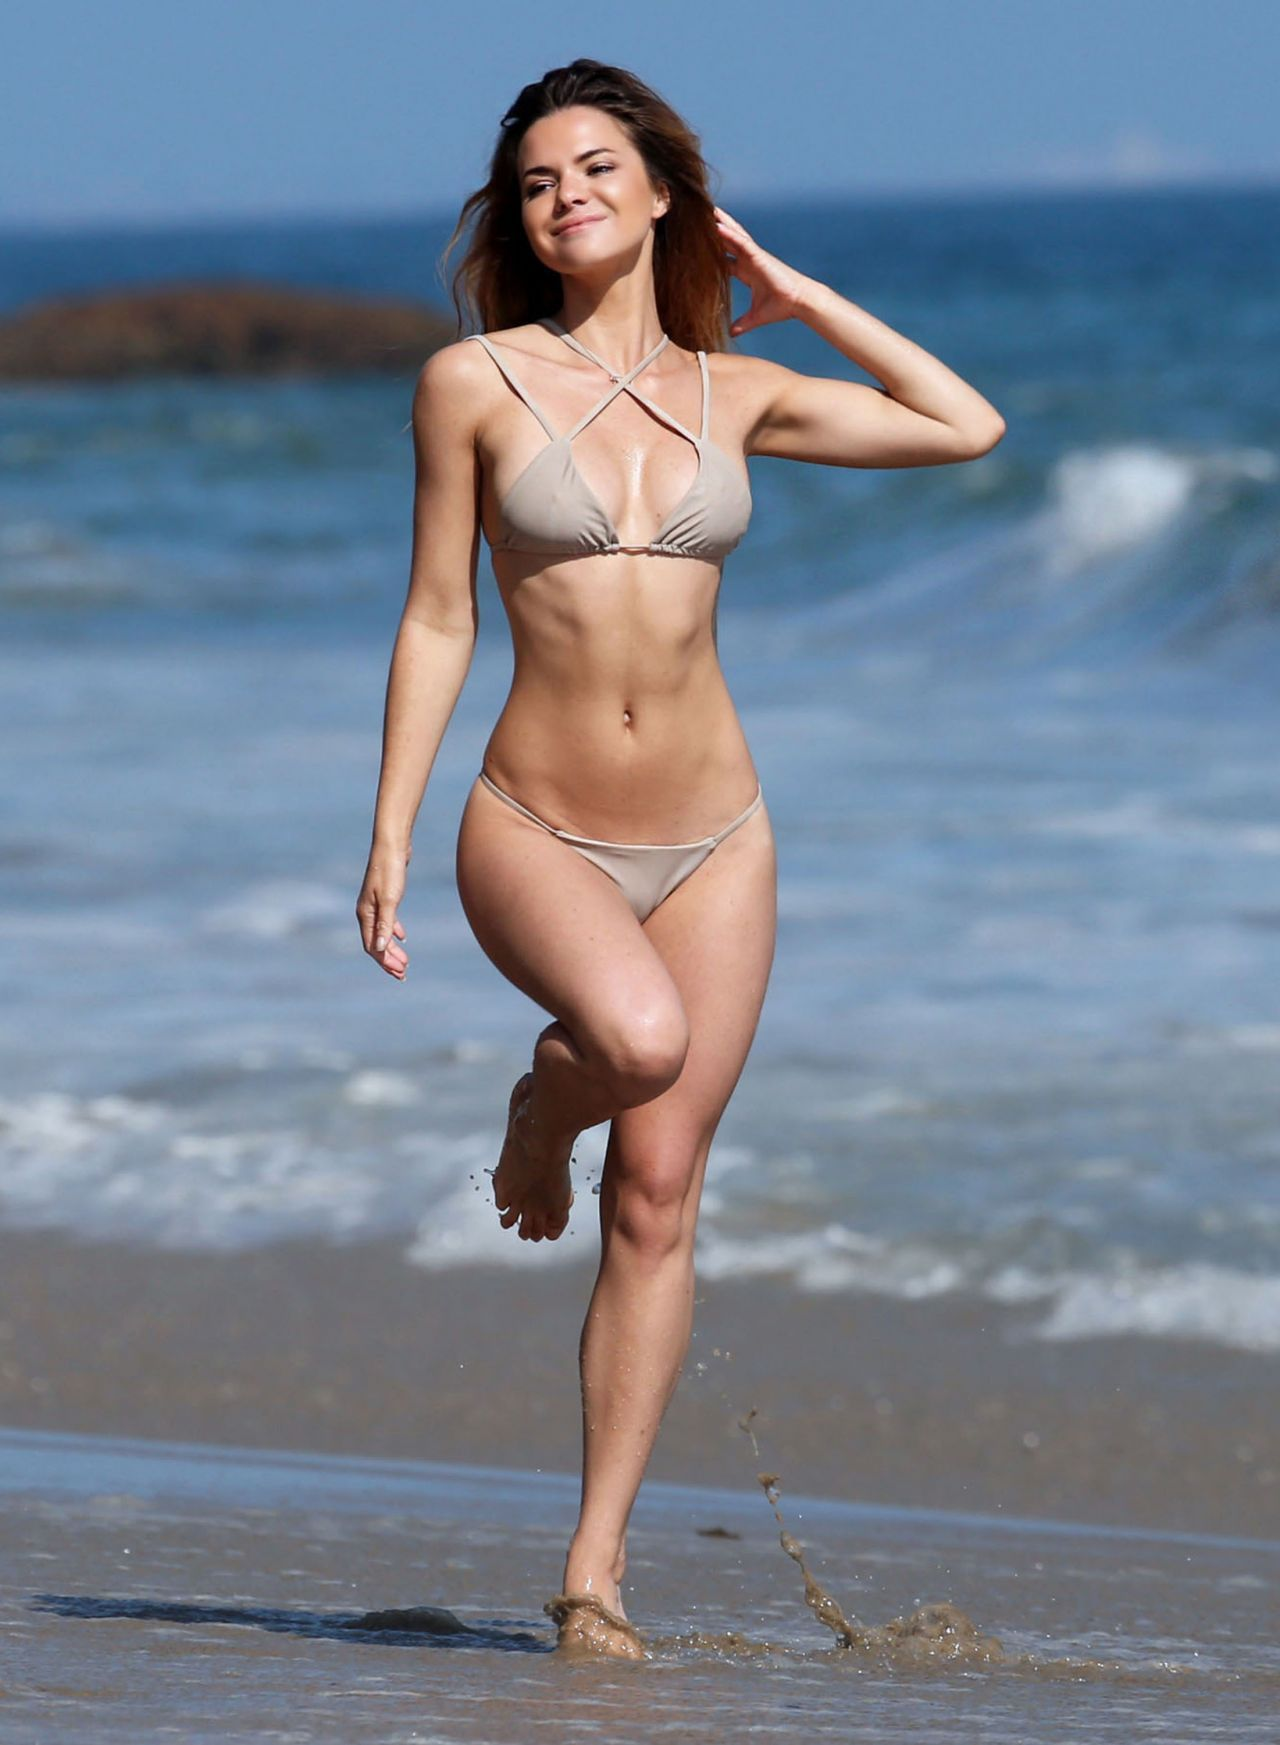 Bikini Kaili Thorne naked (97 foto and video), Topless, Cleavage, Boobs, bra 2015